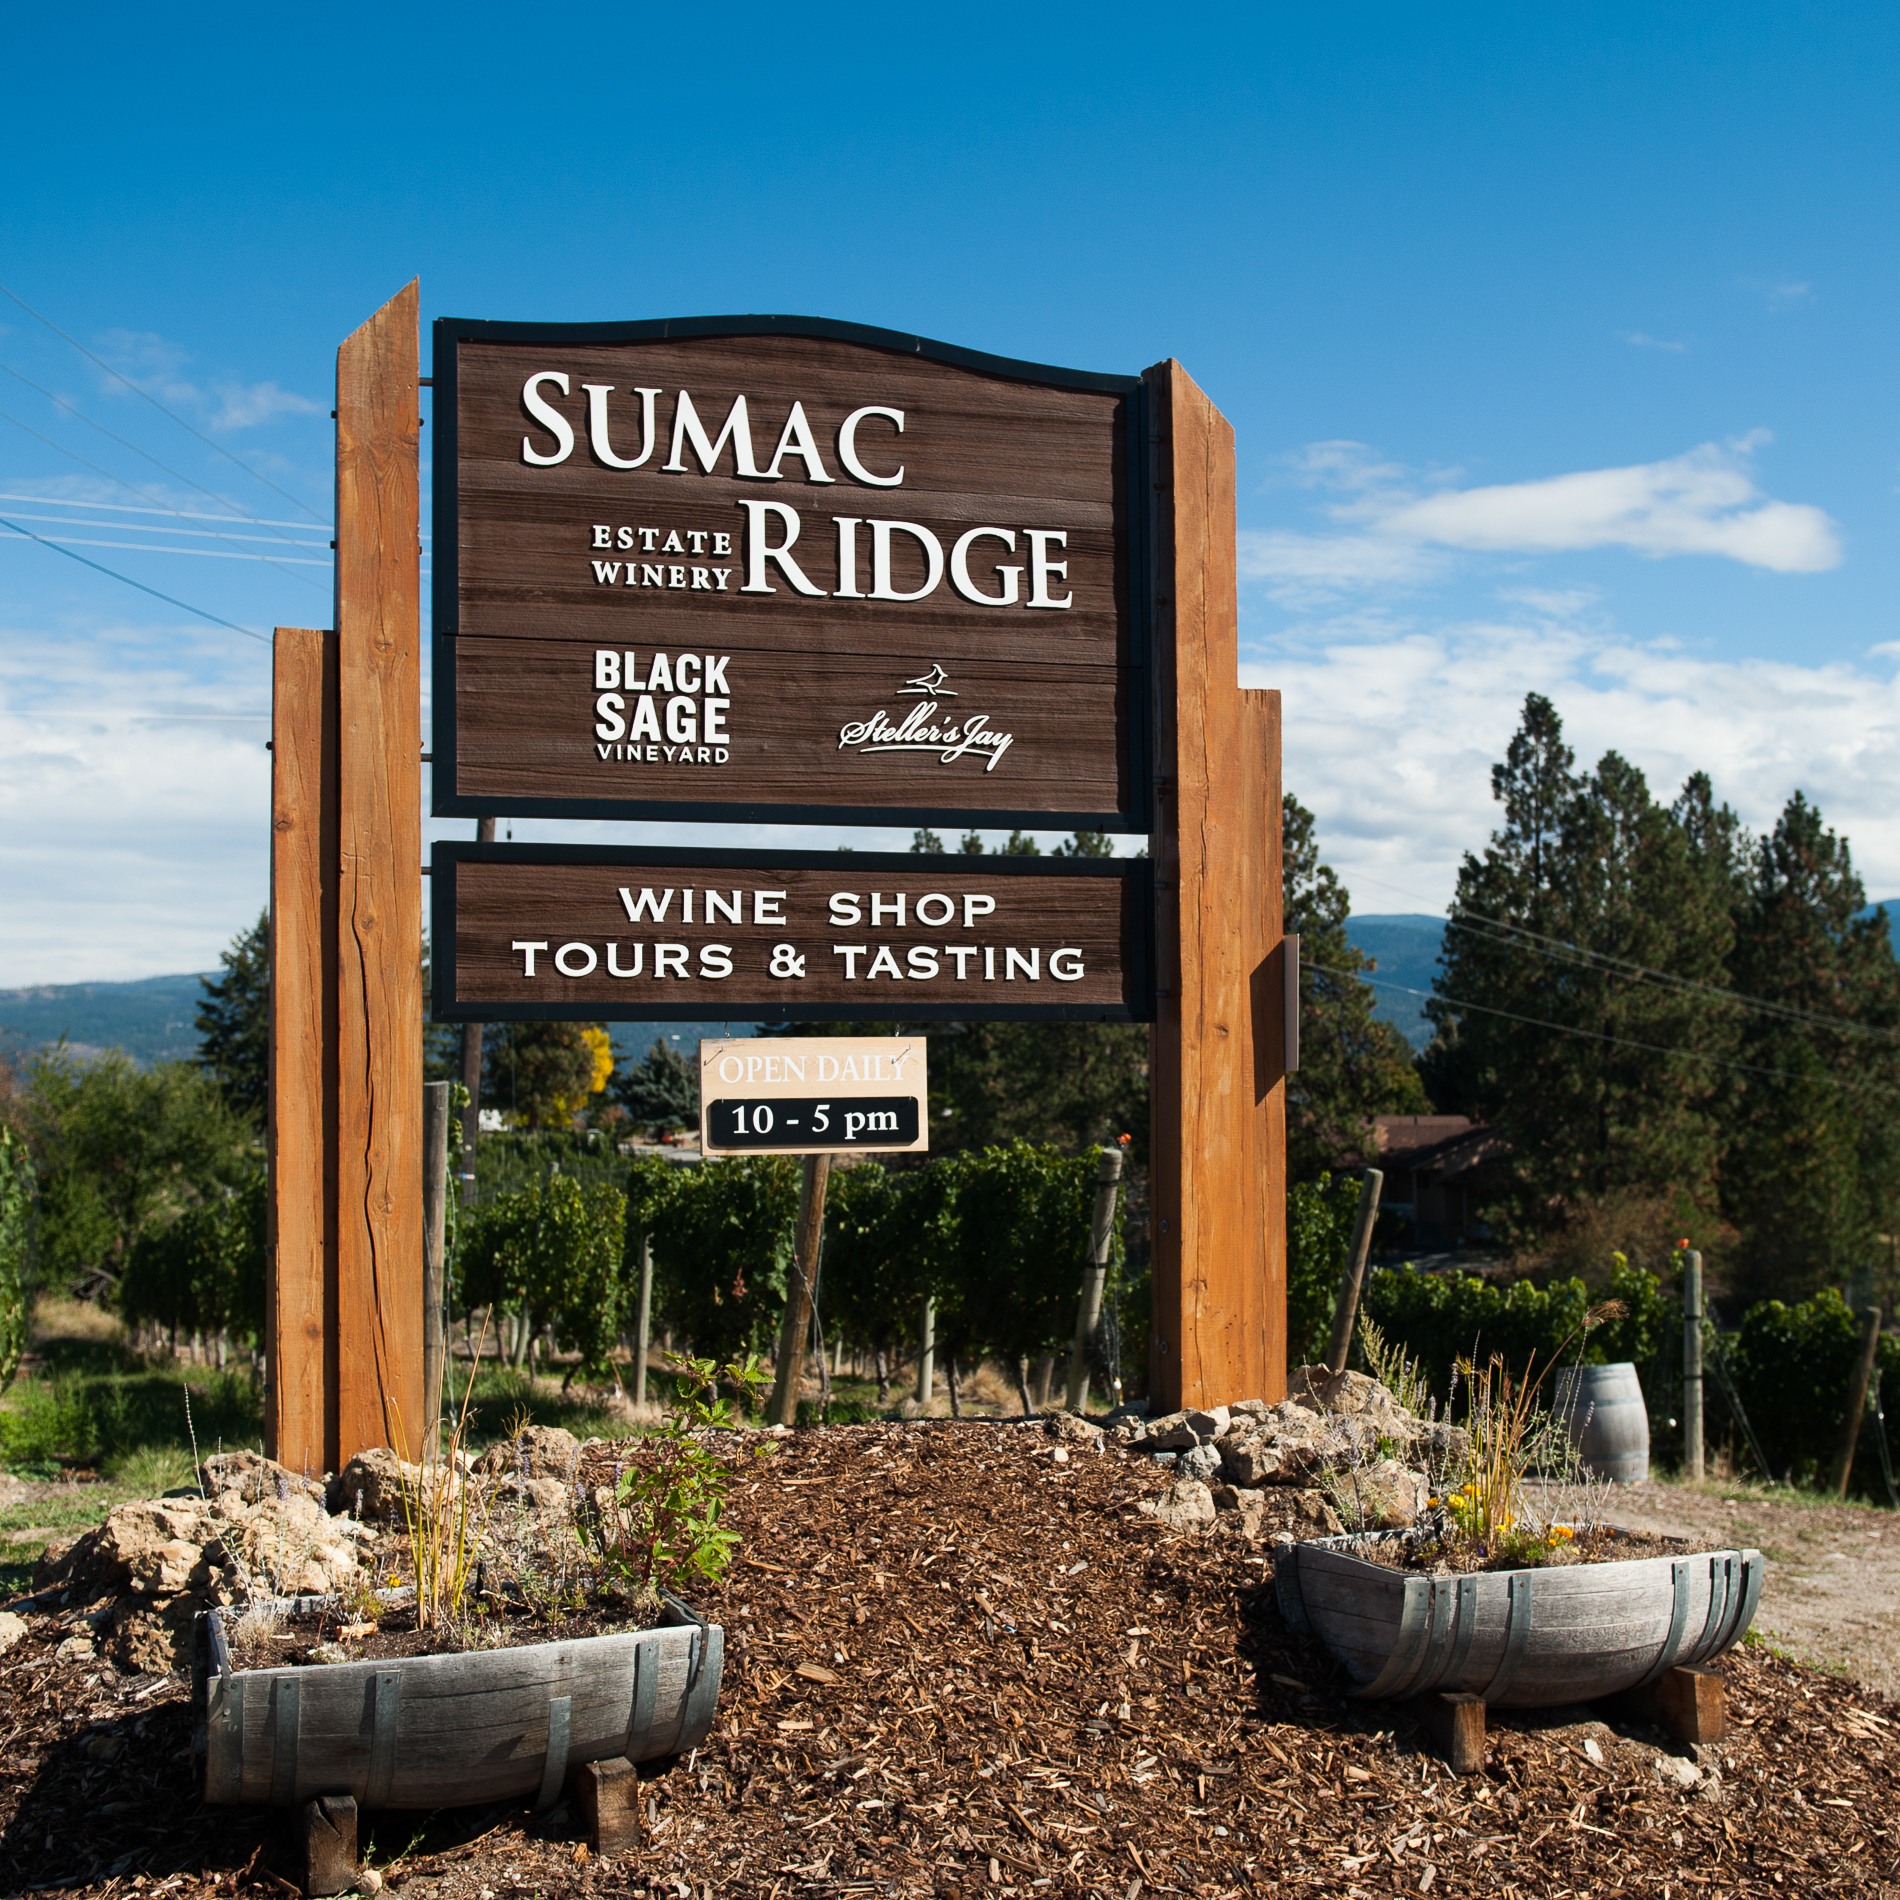 SumacRidge-PRAgency-MilkComms